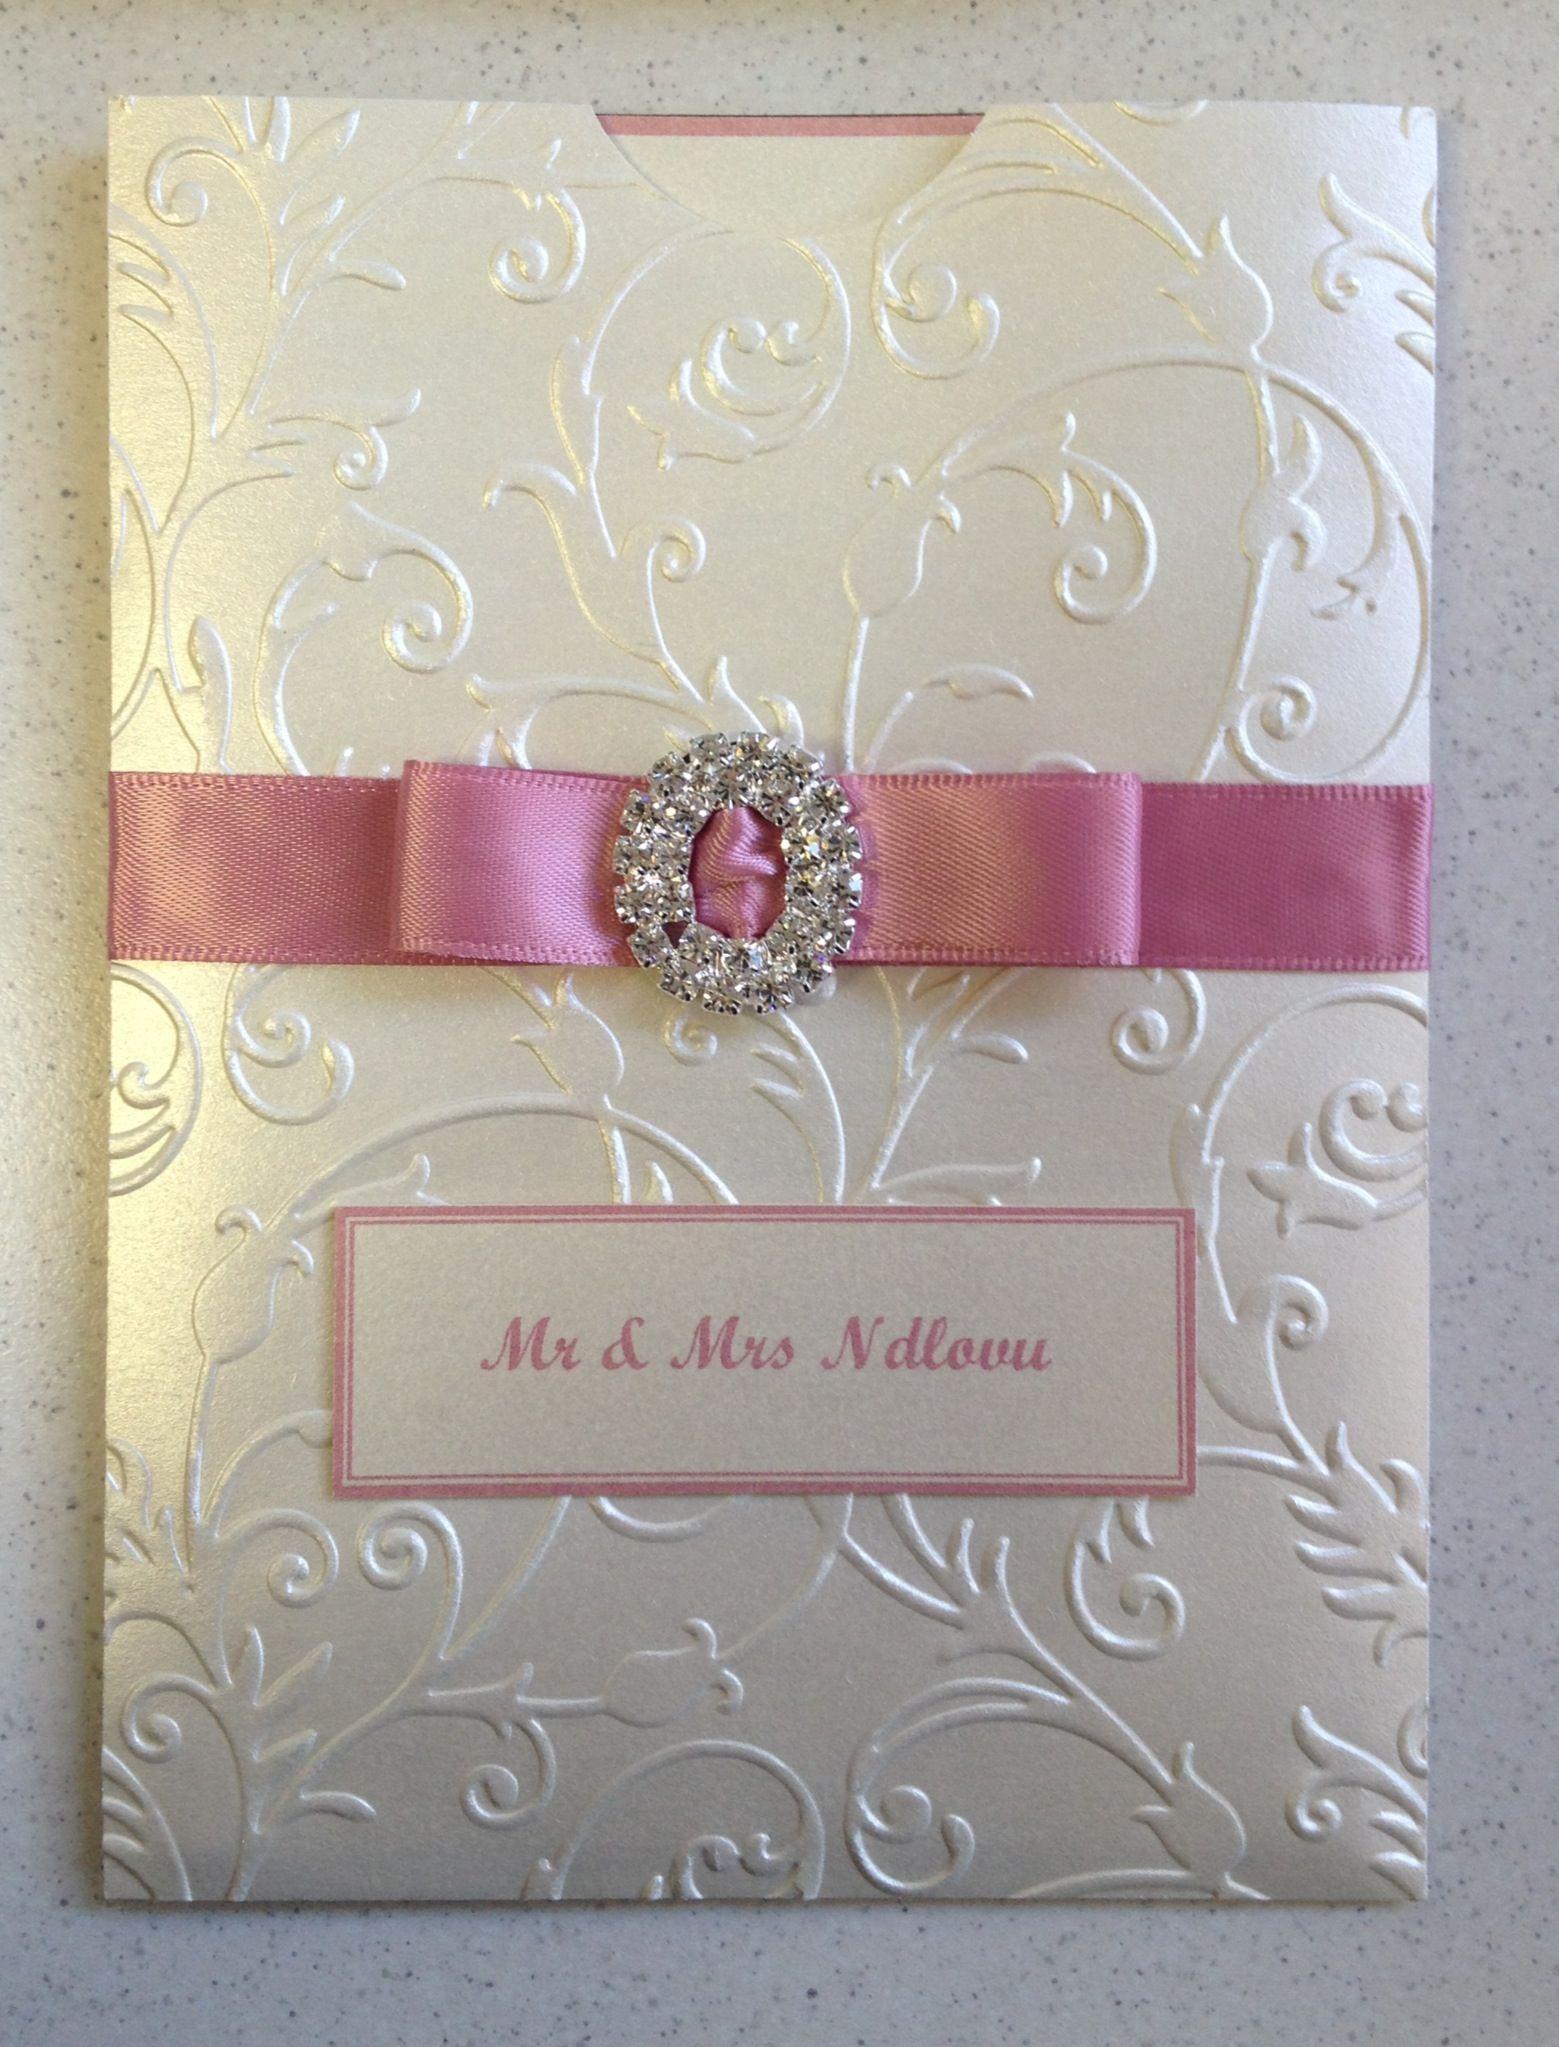 wedding stationery folders%0A Handmade wedding invitations by Micrafts